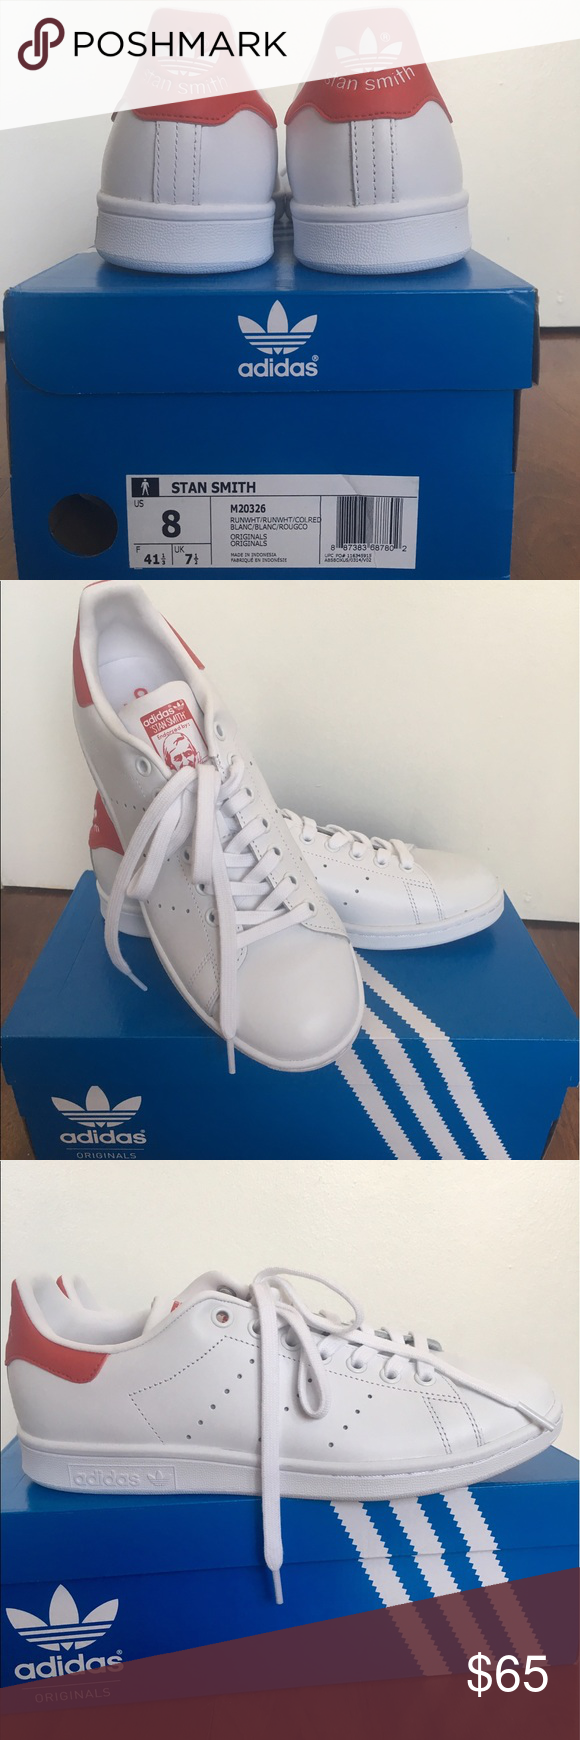 sports shoes cc3c2 d7b69 b43b9ca67345c150a753f0cfd3e7d87d.png